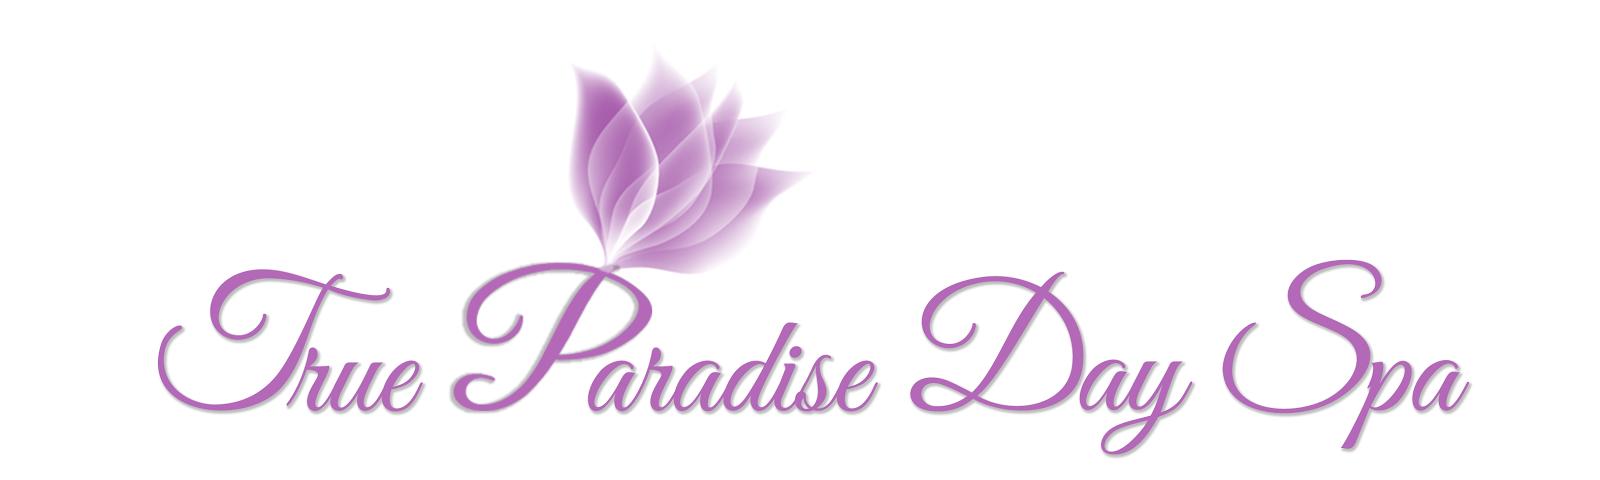 True Paradise Day Spa